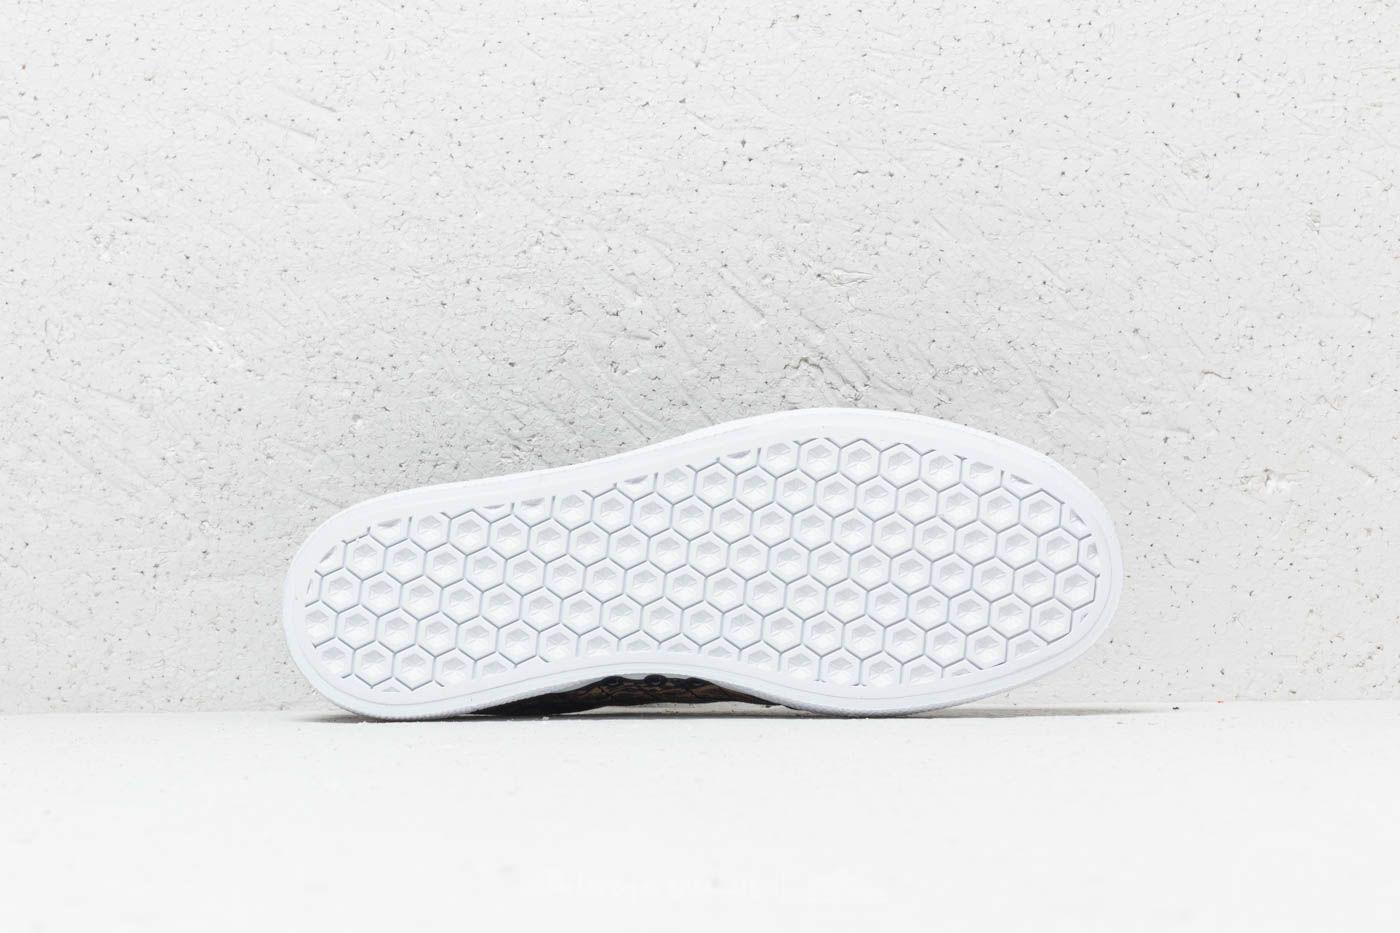 Lyst - adidas Originals Adidas 3mc Core Black  Brown  Night Cargo ... 19a527c0b